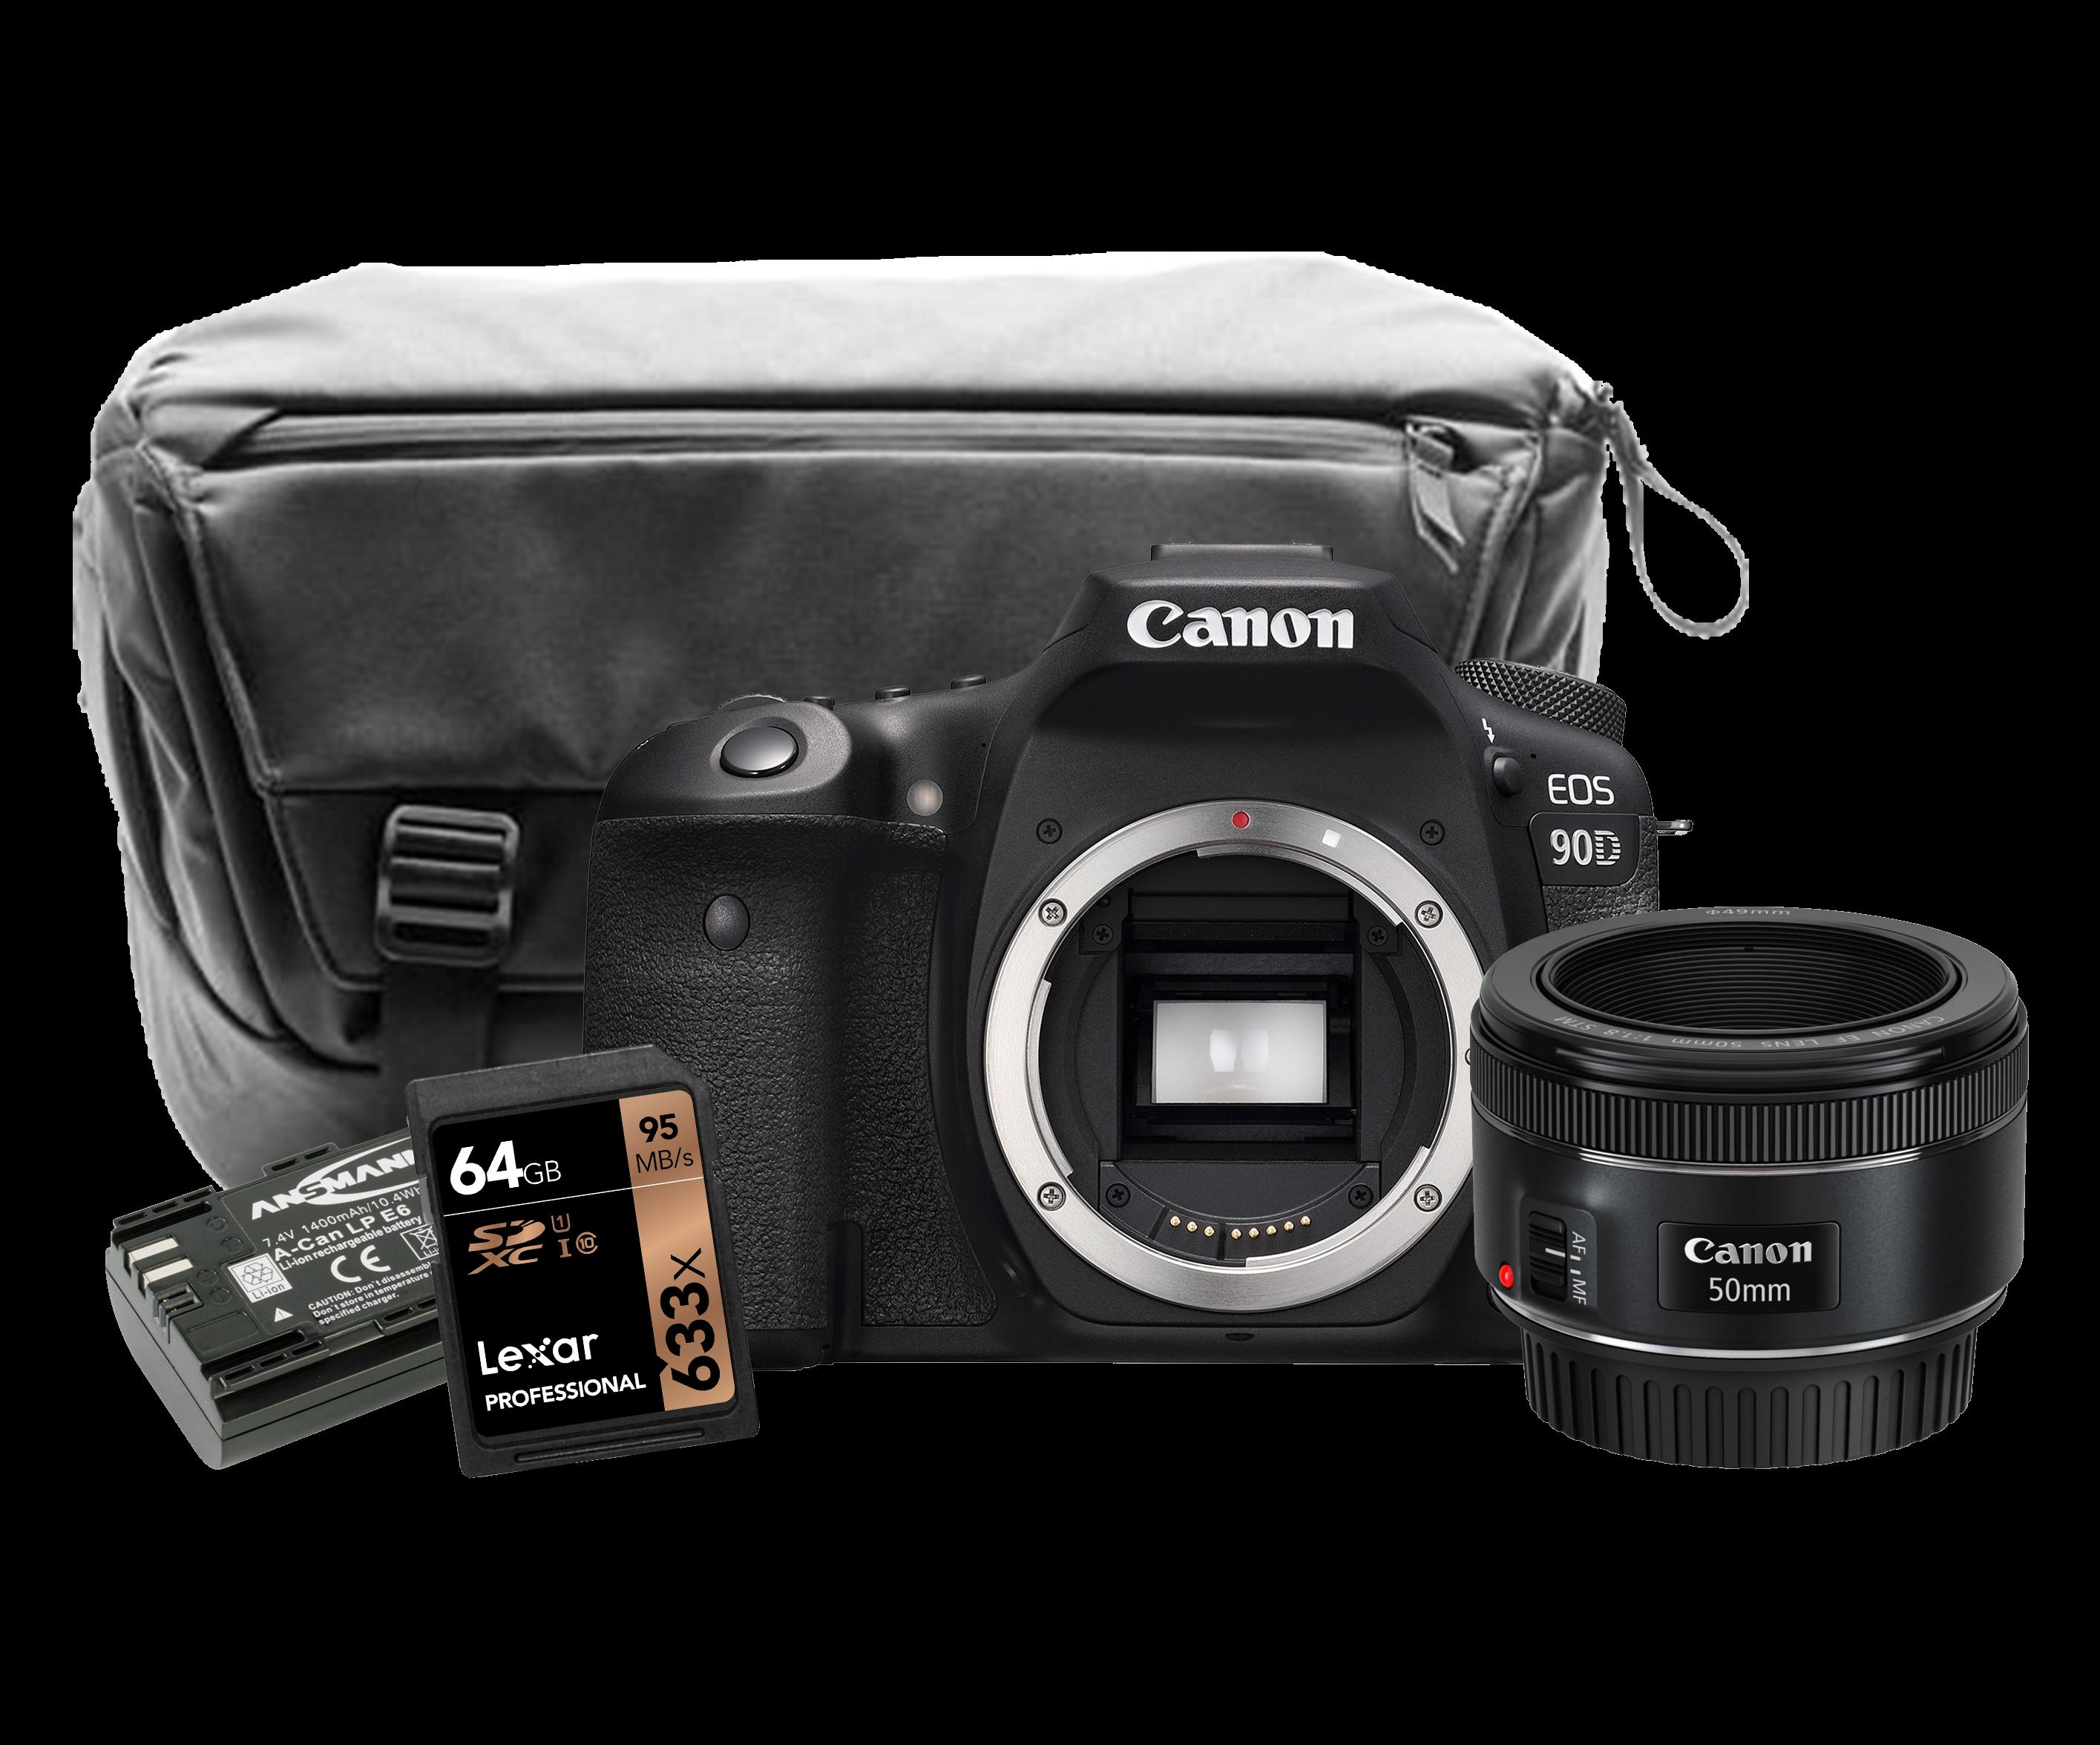 Canon EOS 90D DSLR Camera Exclusive Kit